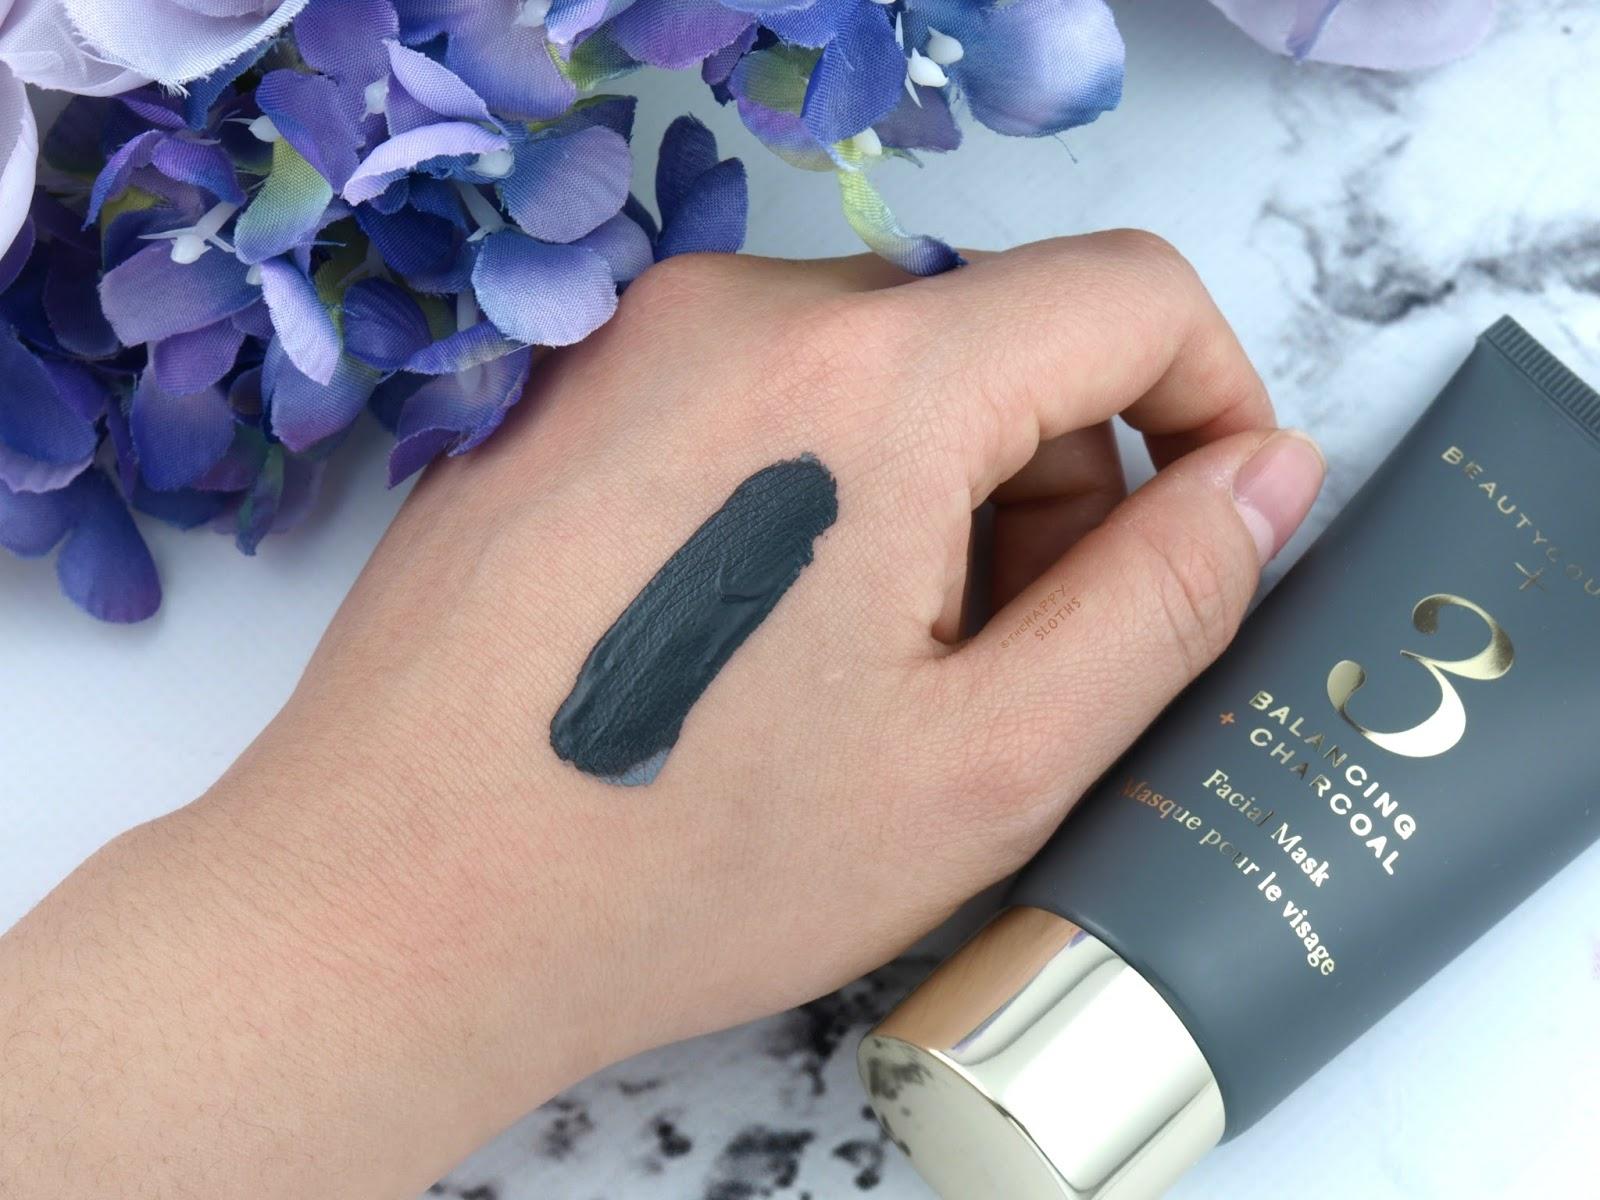 Beautycounter+ No. 3 Balancing Facial Mask Review